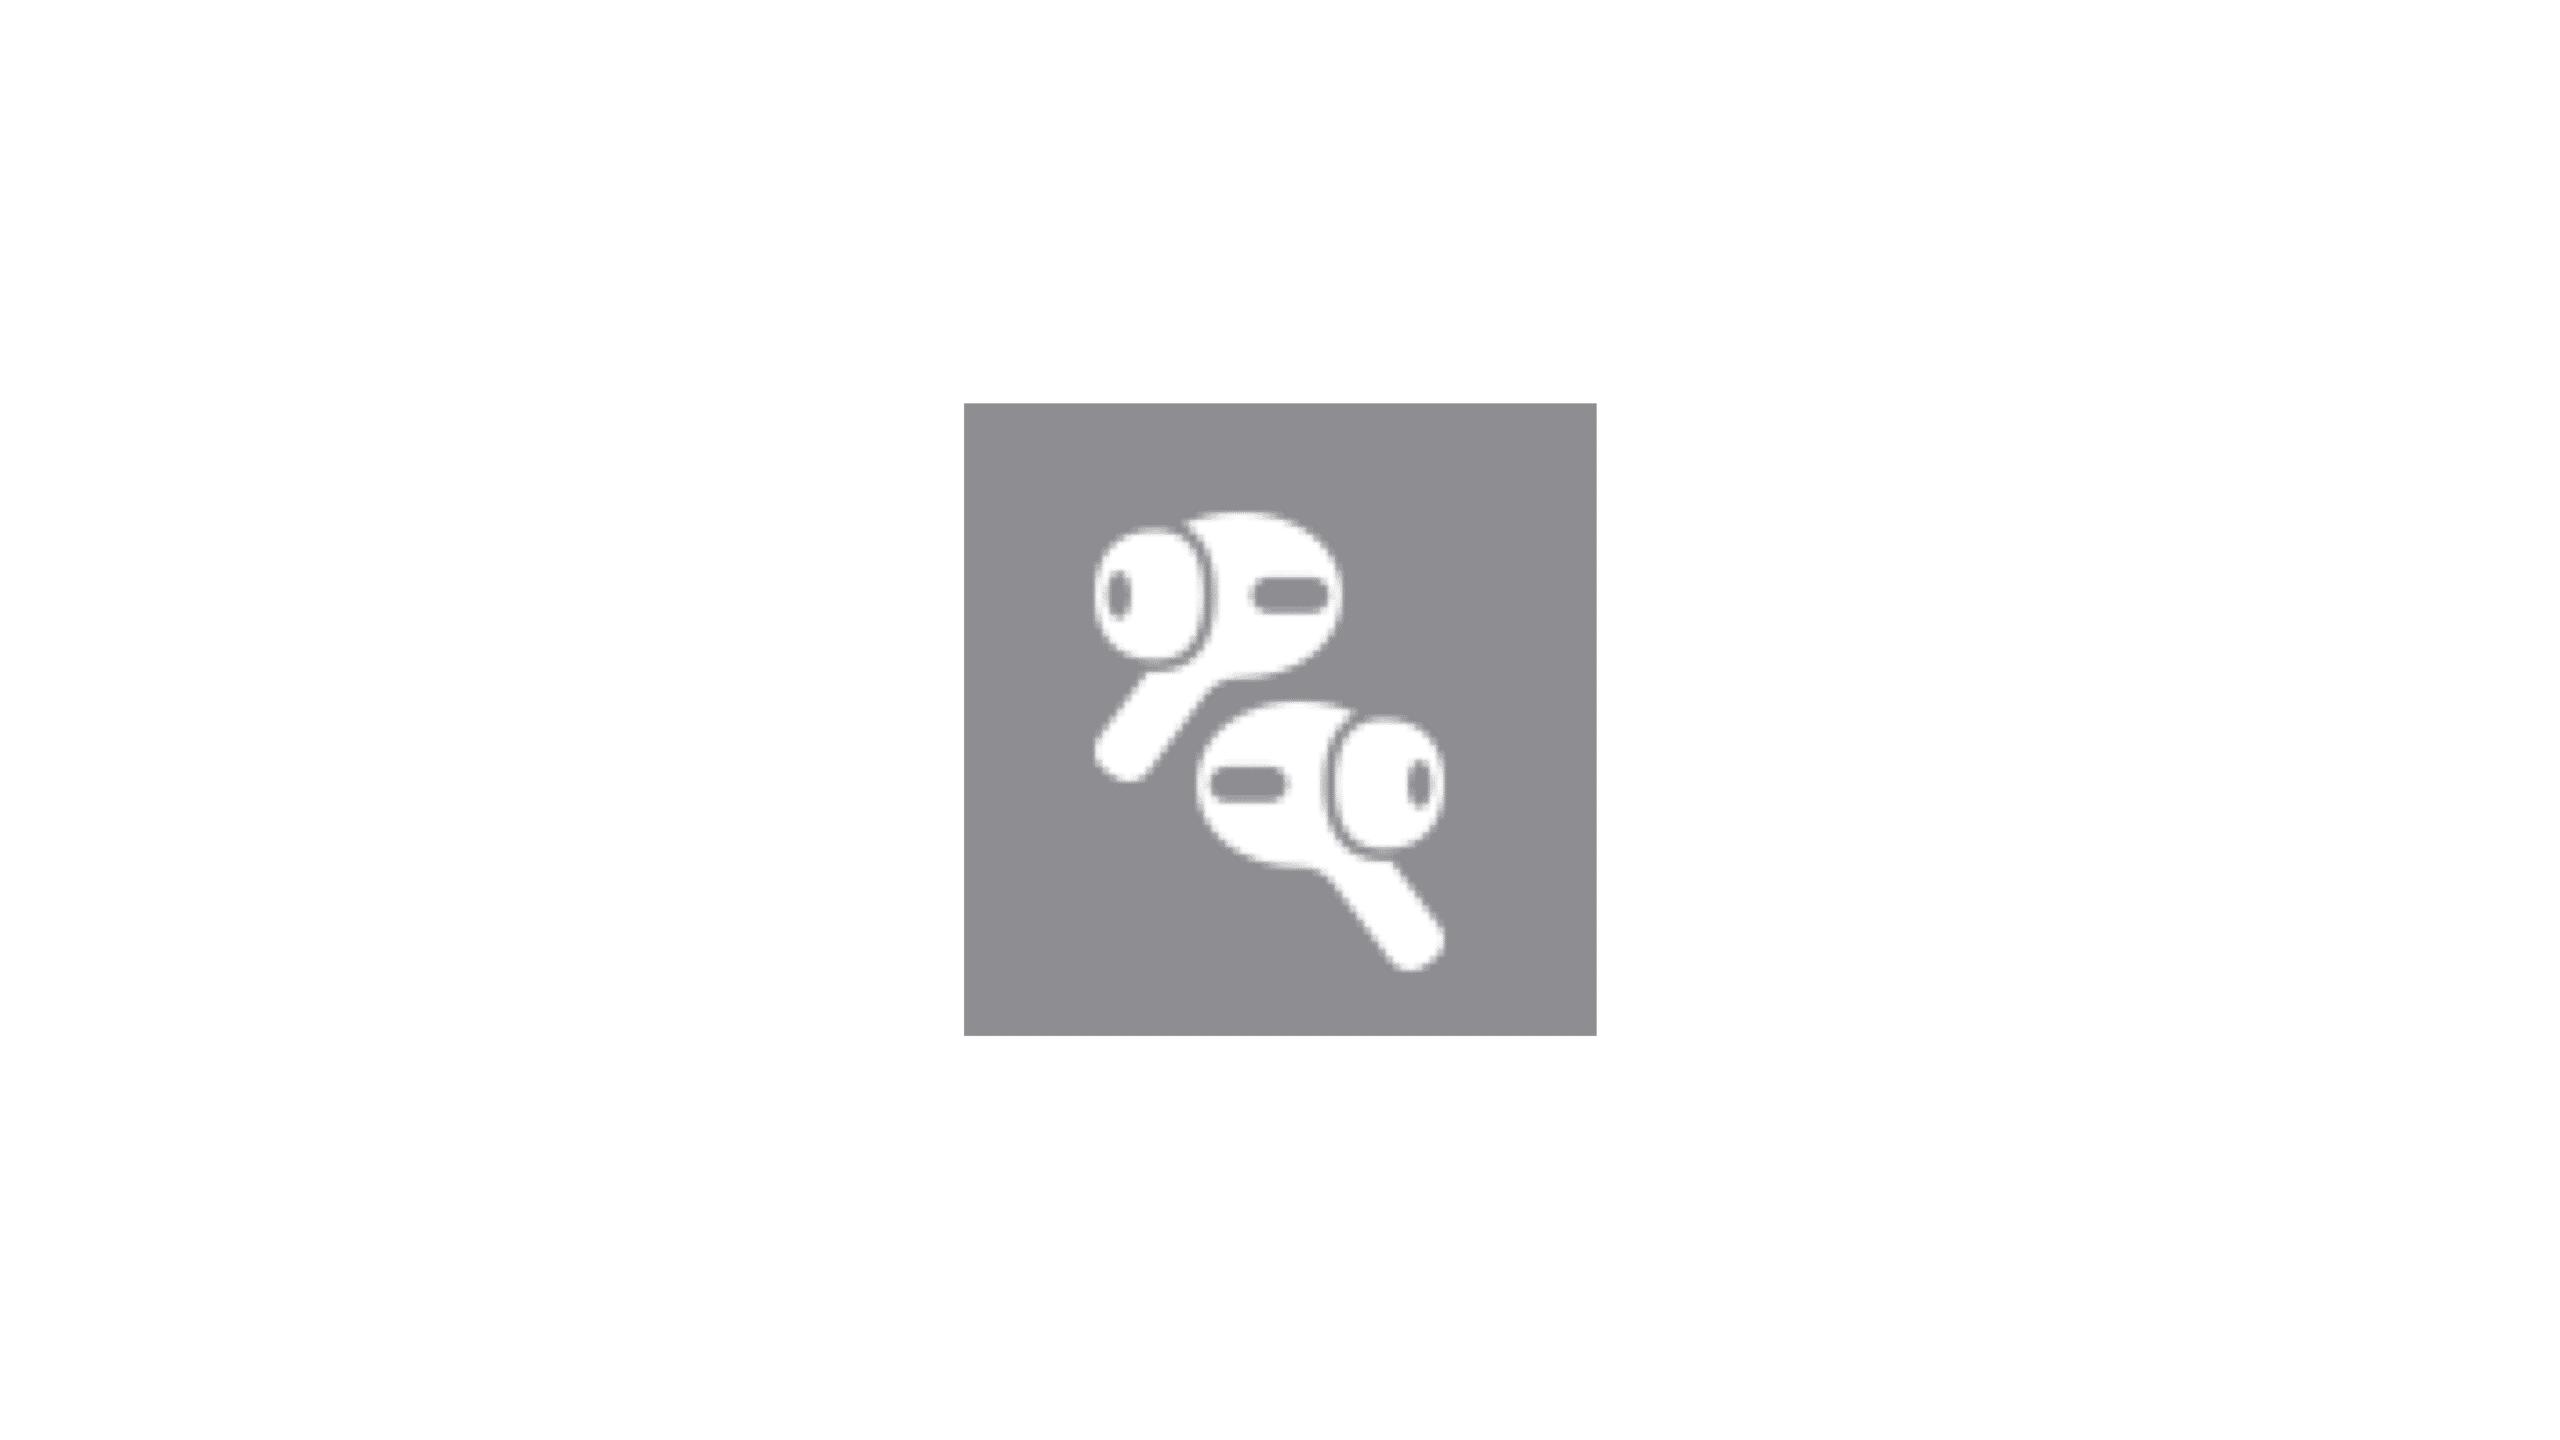 AirPods Leak in iOS 13 / 9to5Mac